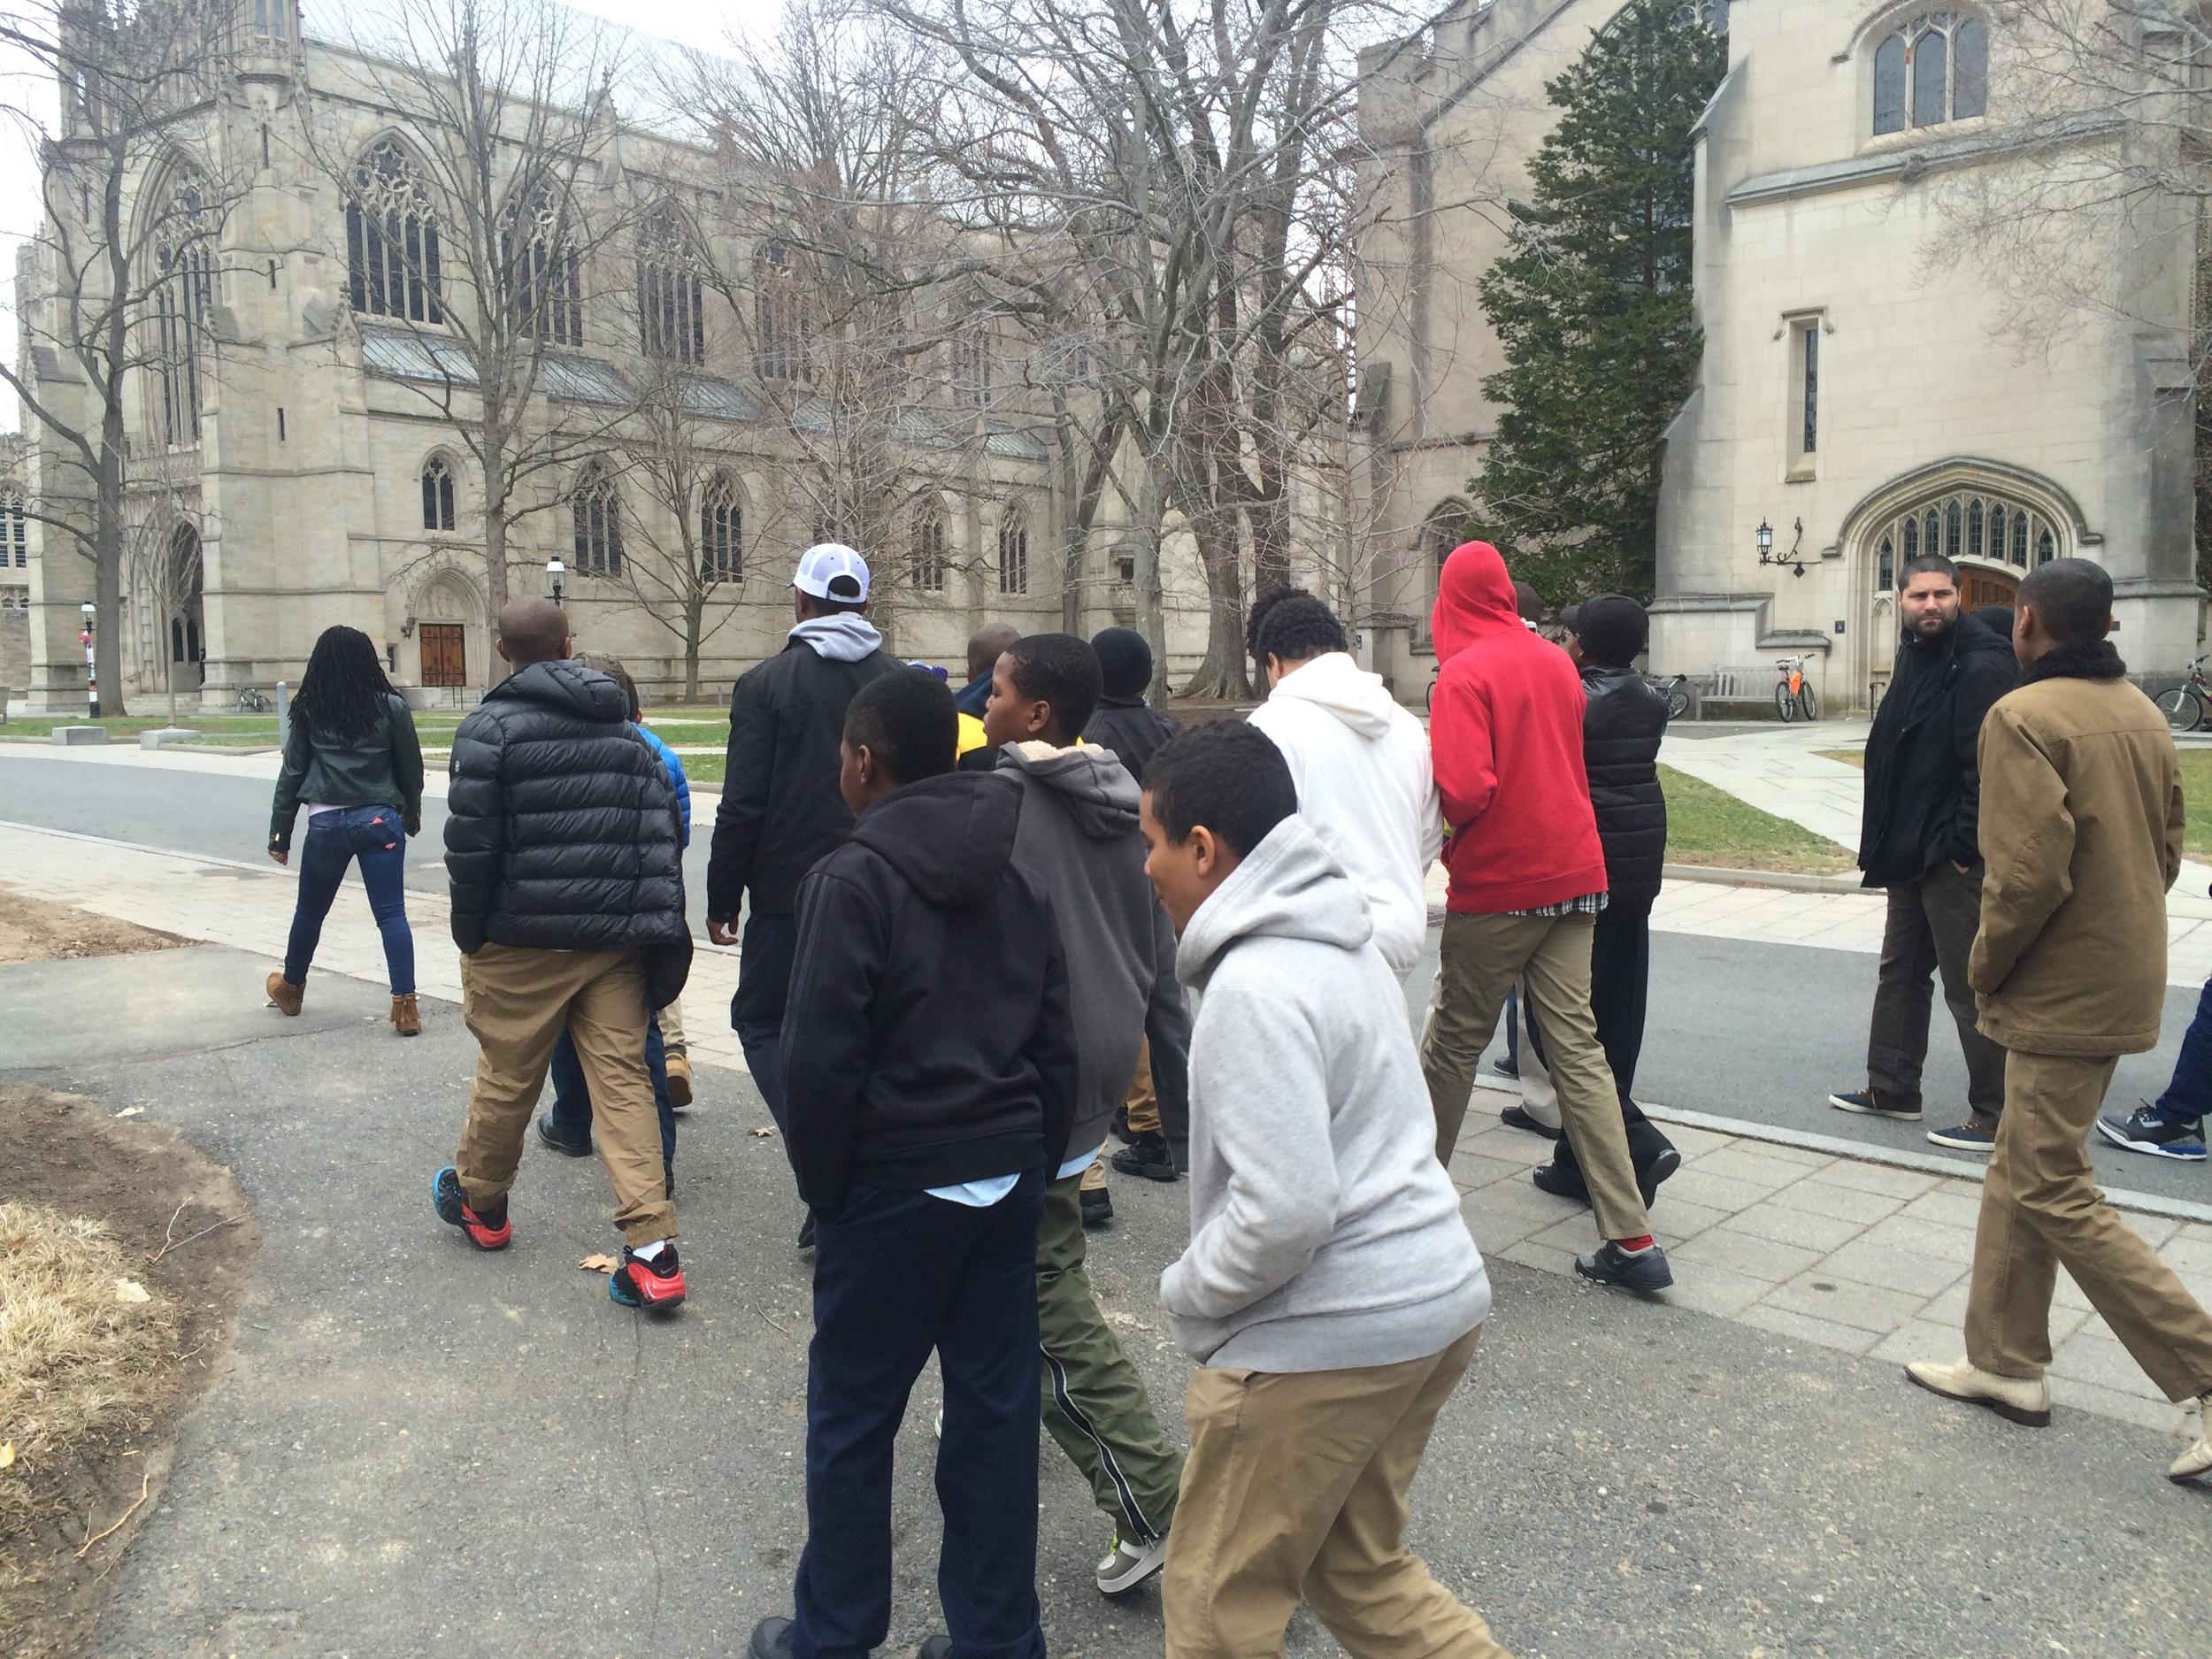 FDA Boys in Princeton 2015 Photo #6.jpg